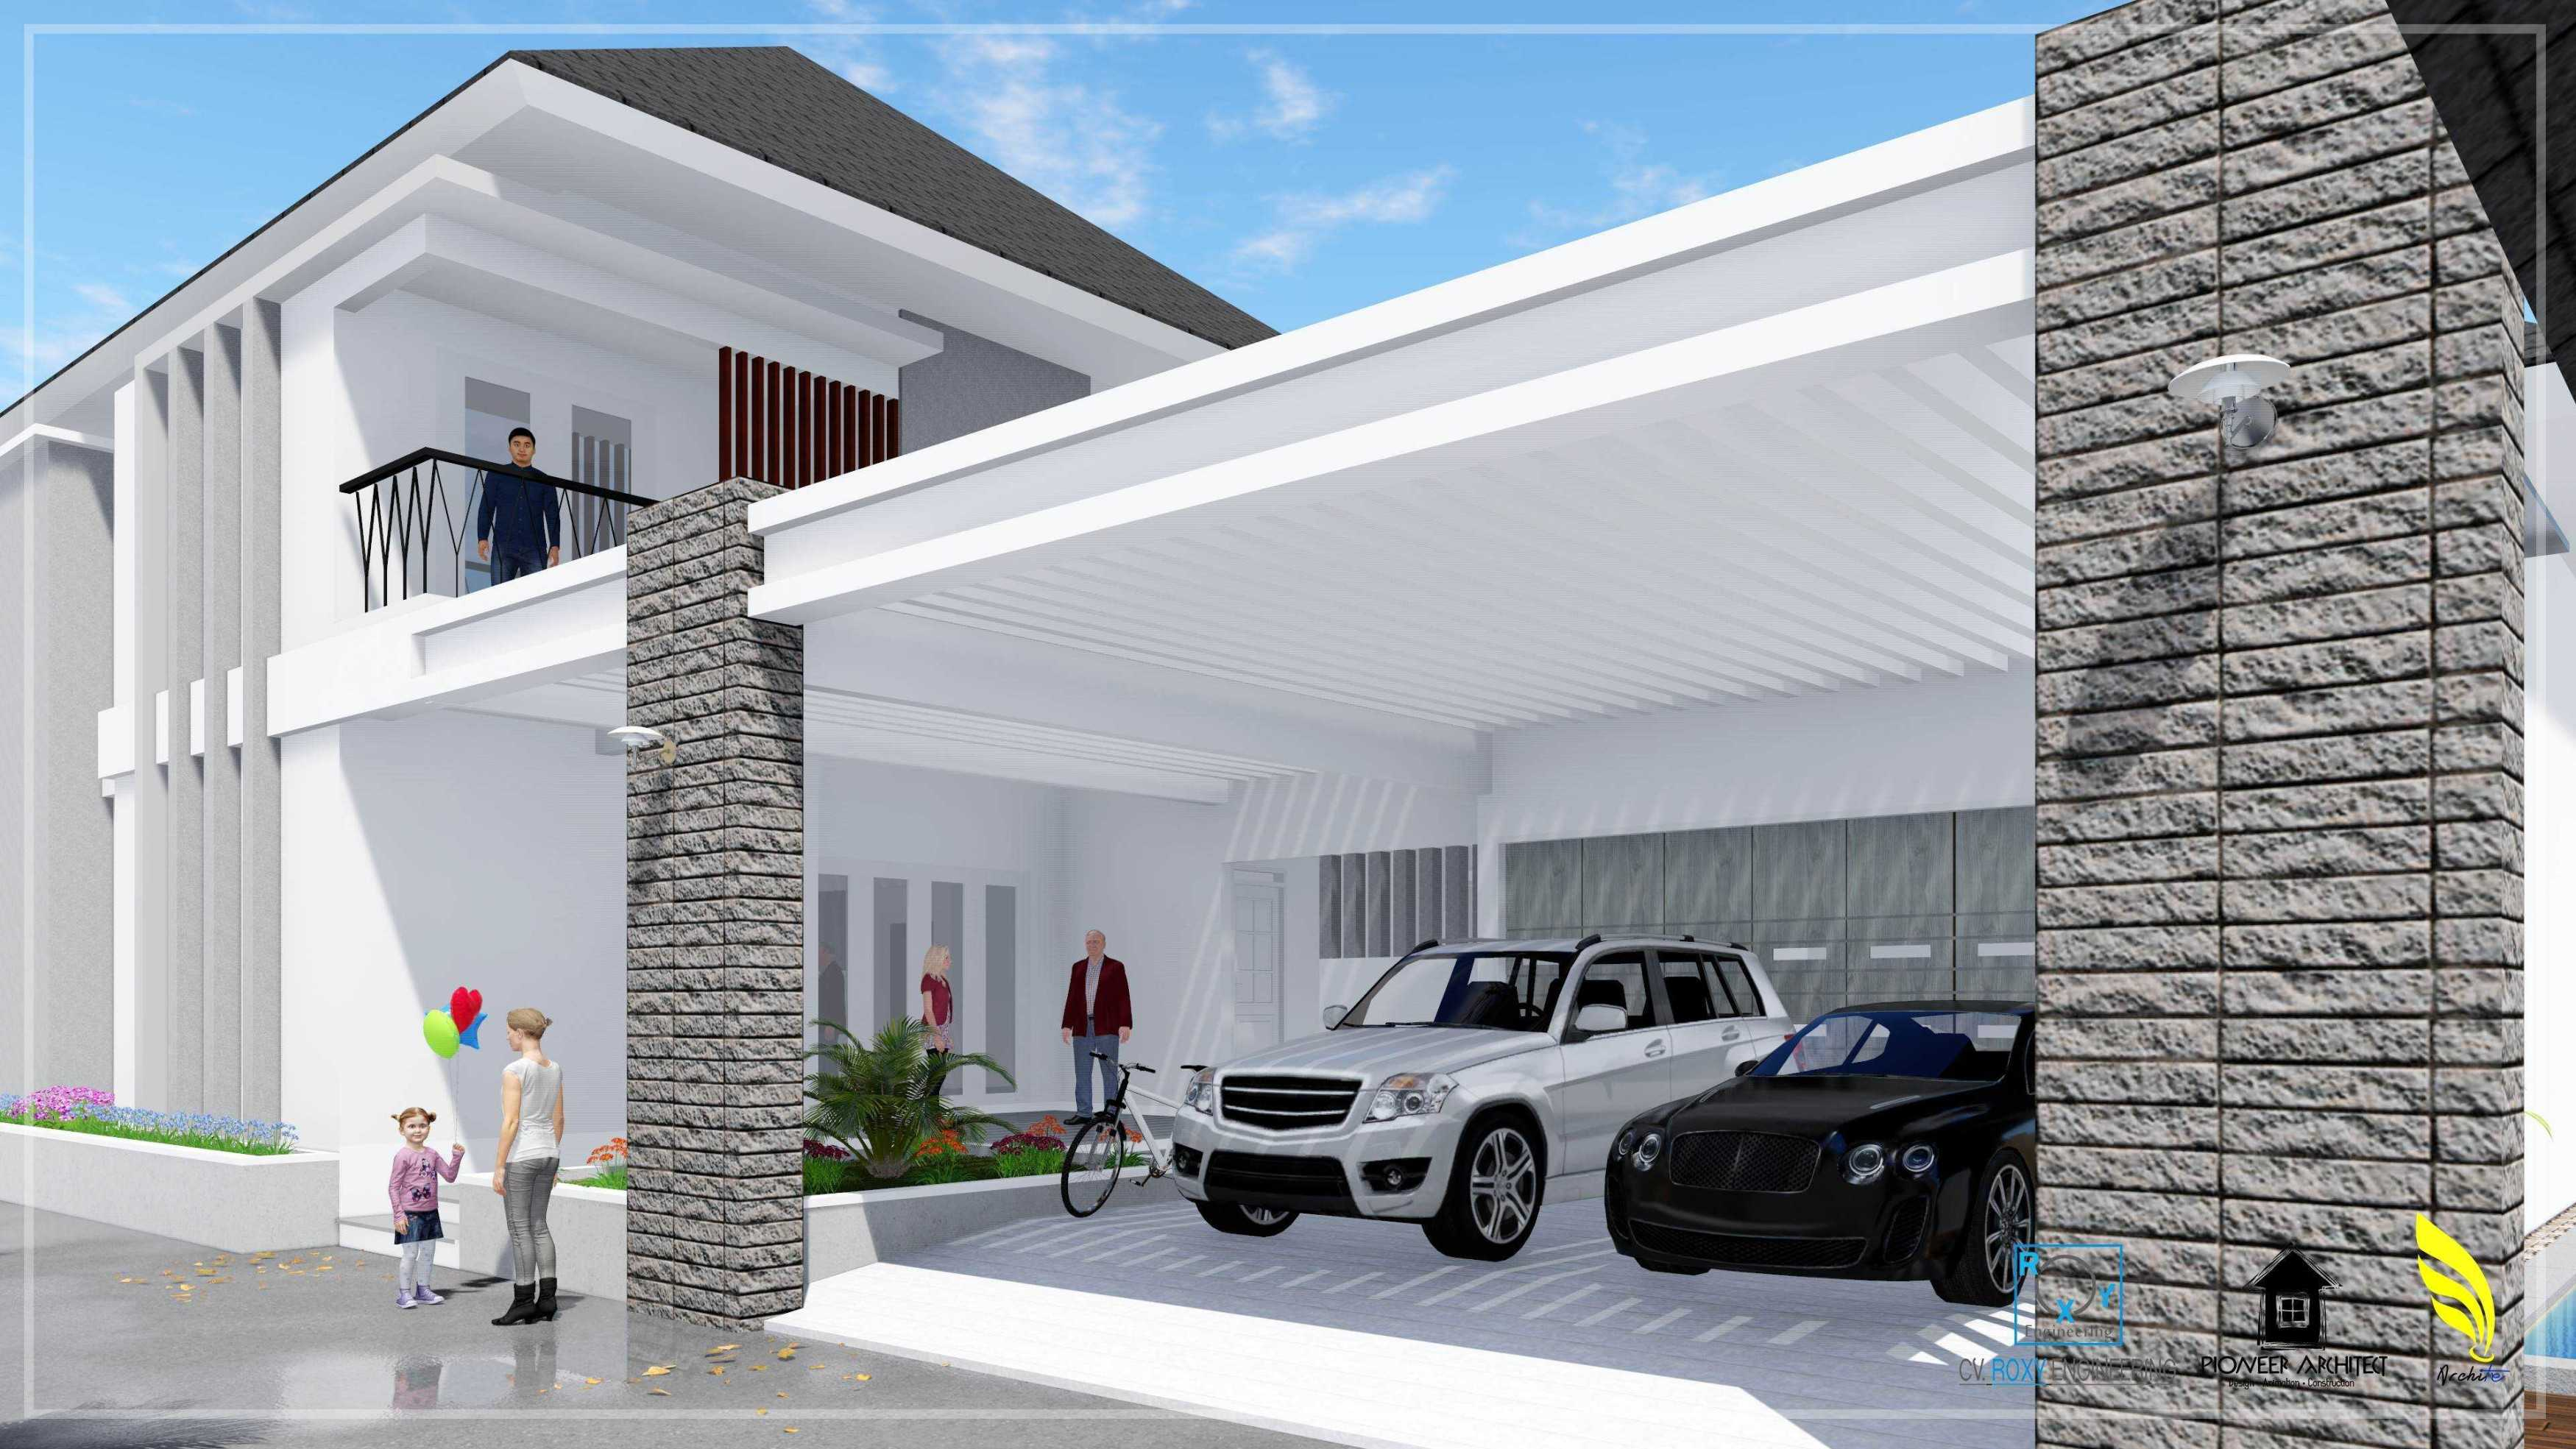 Pionner Architect R House Banda Aceh, Kota Banda Aceh, Aceh, Indonesia Banda Aceh, Kota Banda Aceh, Aceh, Indonesia Parking Area   43253